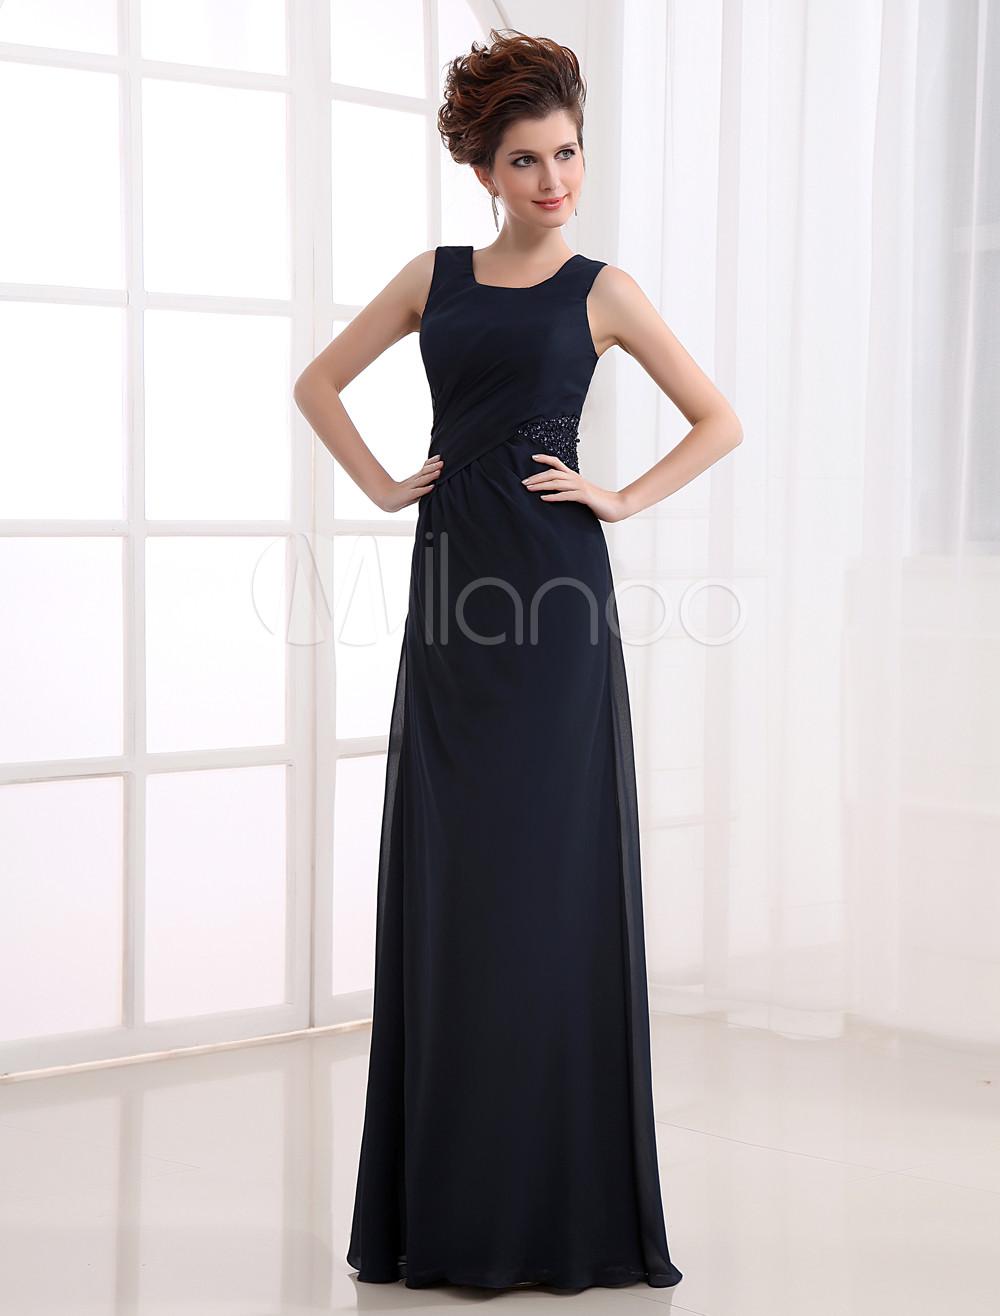 Elegant Deep Navy Blue Spinning Prom Dress